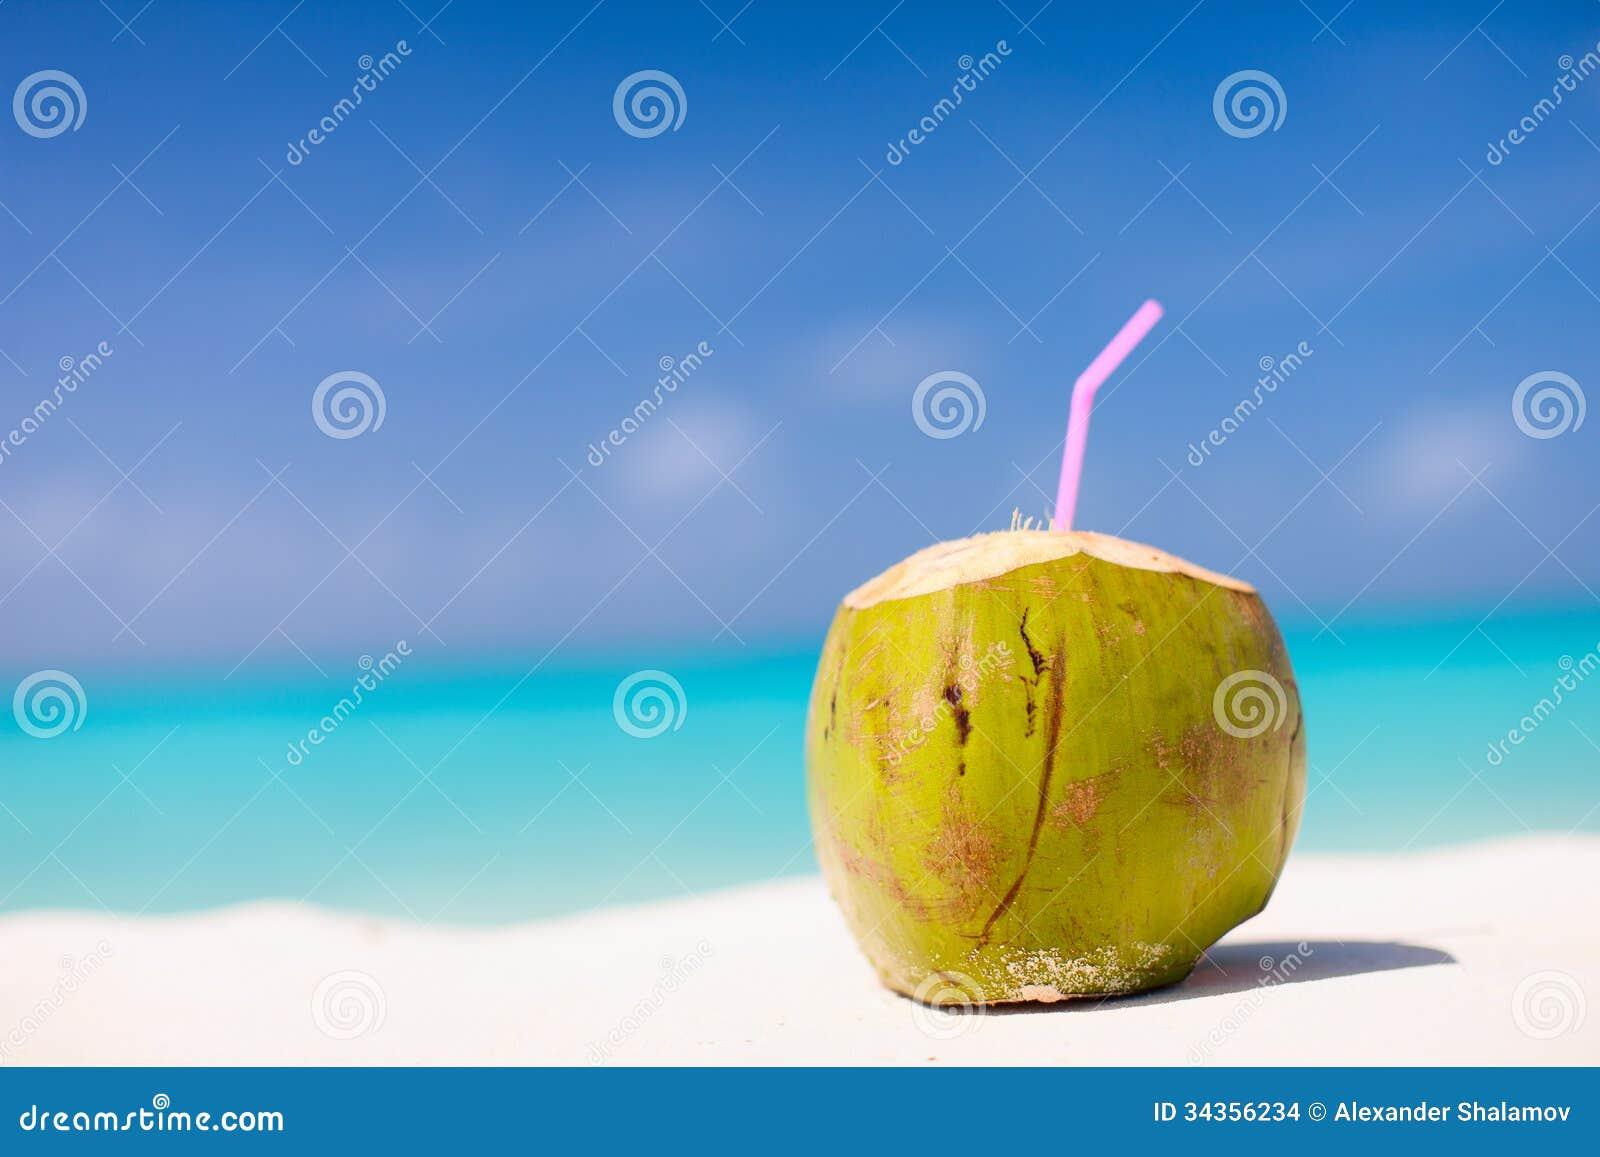 coconut on a tropical beach stock photo image 34356234